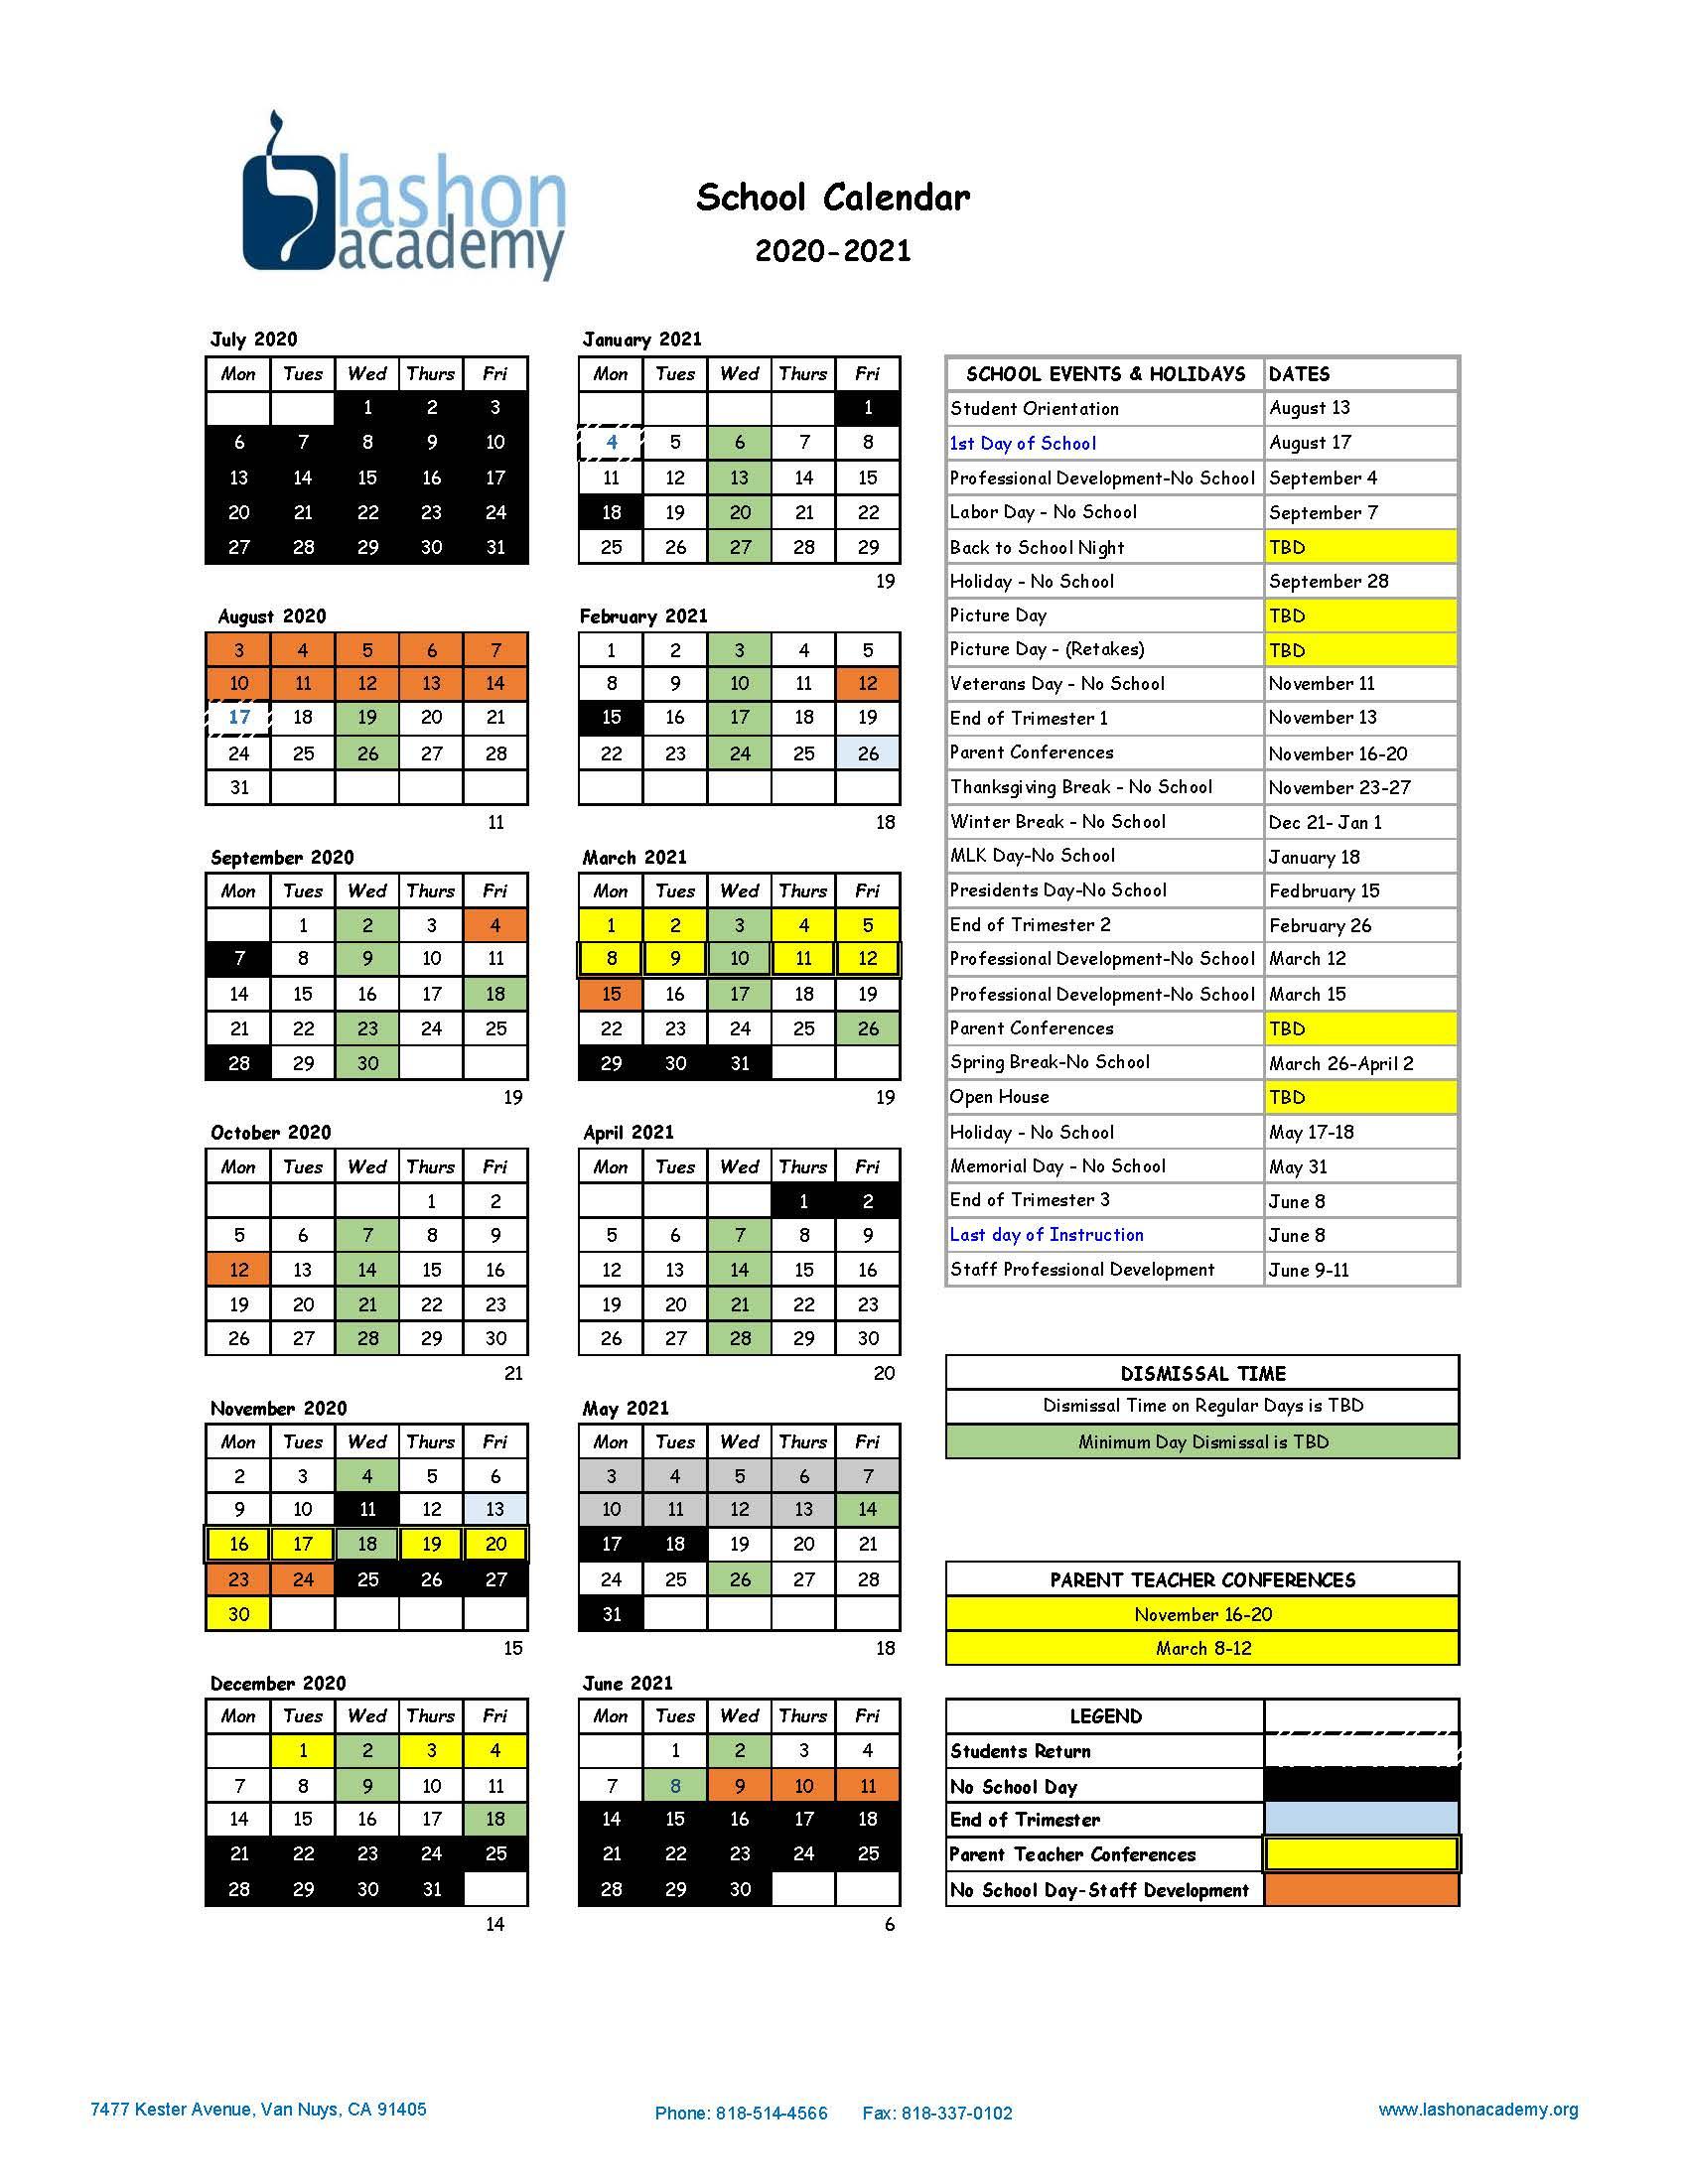 School Calendars | Lashon Academy Charter School Within University Of Southern California School Calendar 2021 2020